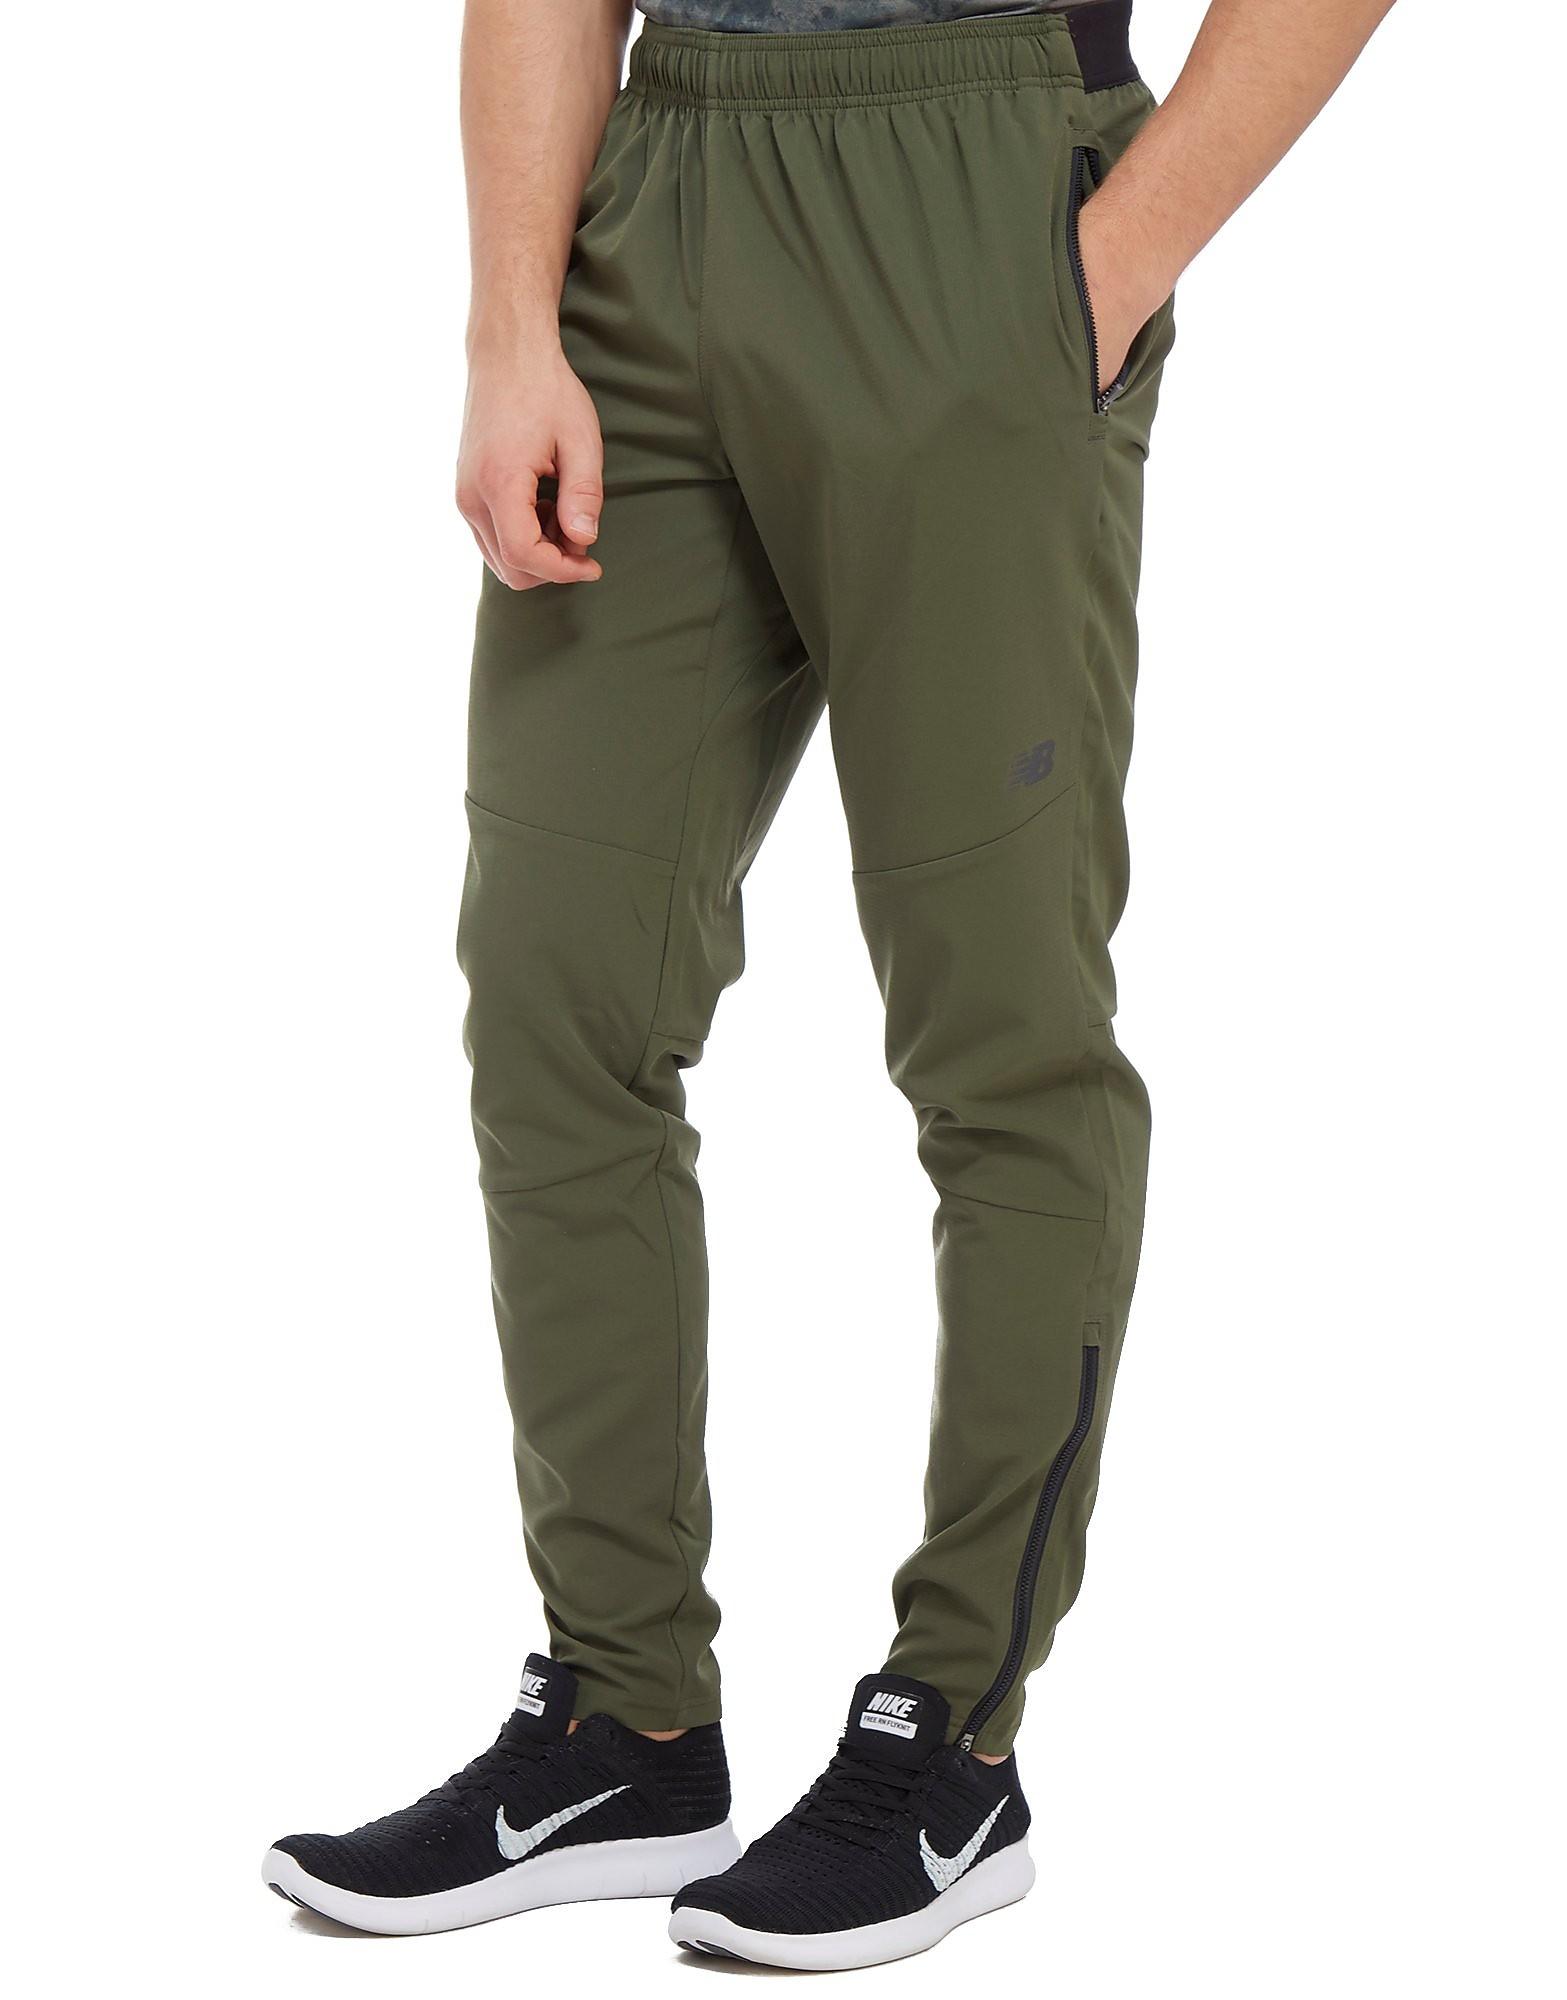 Max Intensity Pants